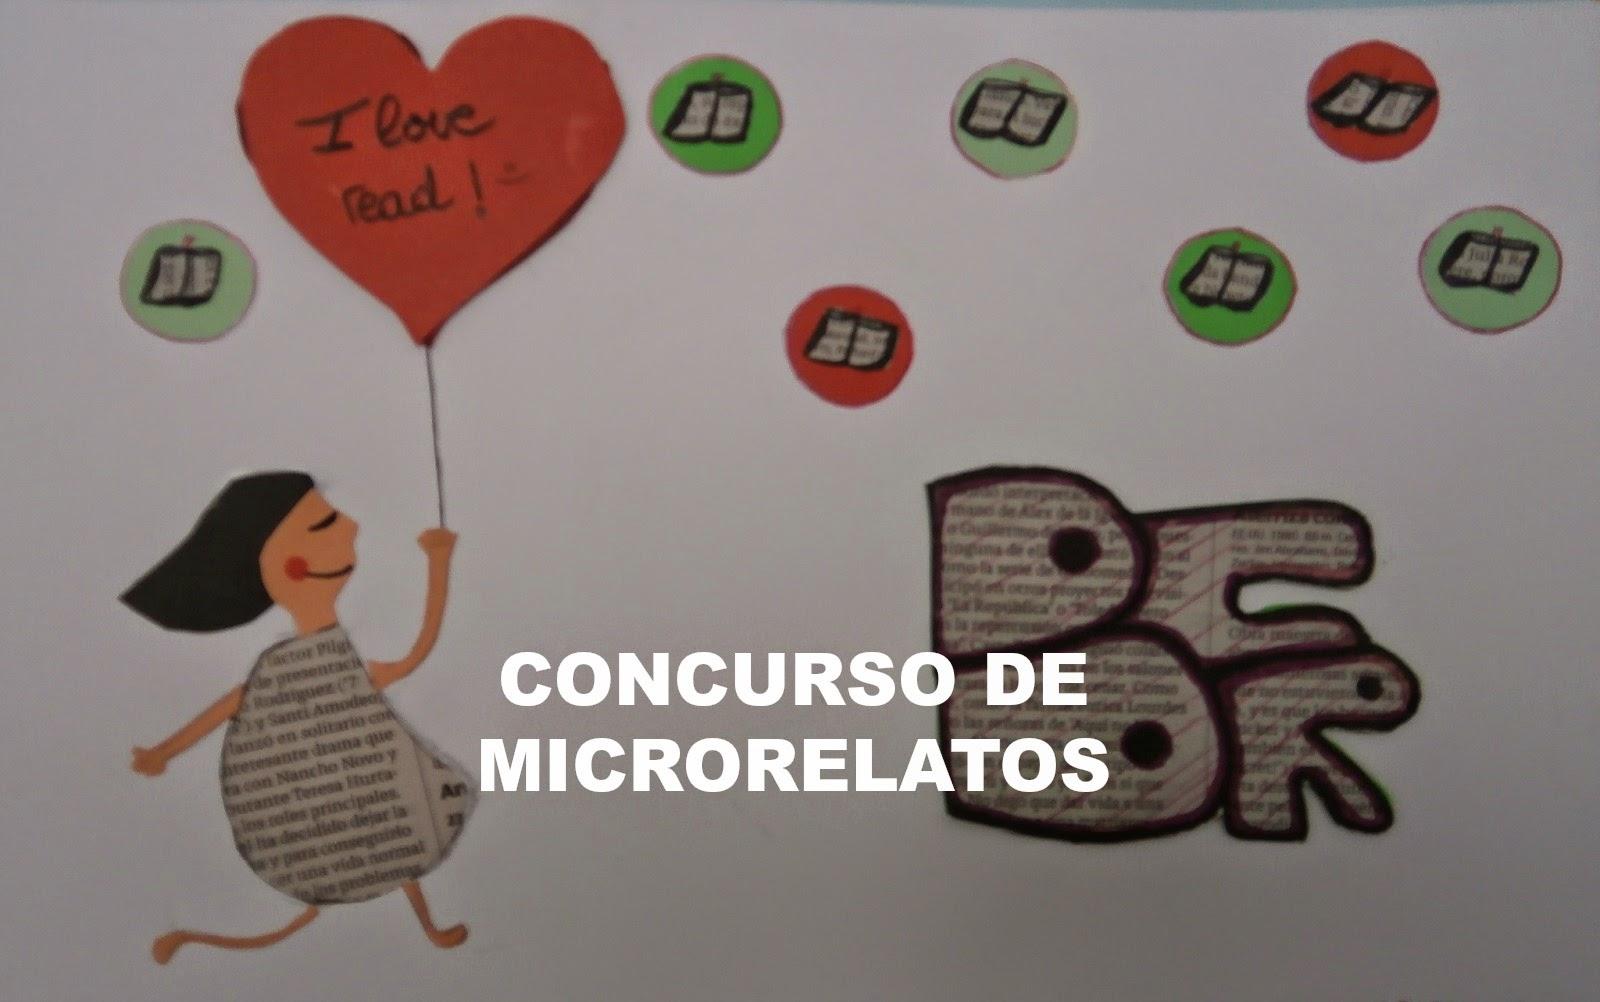 http://blogfuenteroniel.blogspot.com.es/2015/04/concurso-de-microrelatos.html